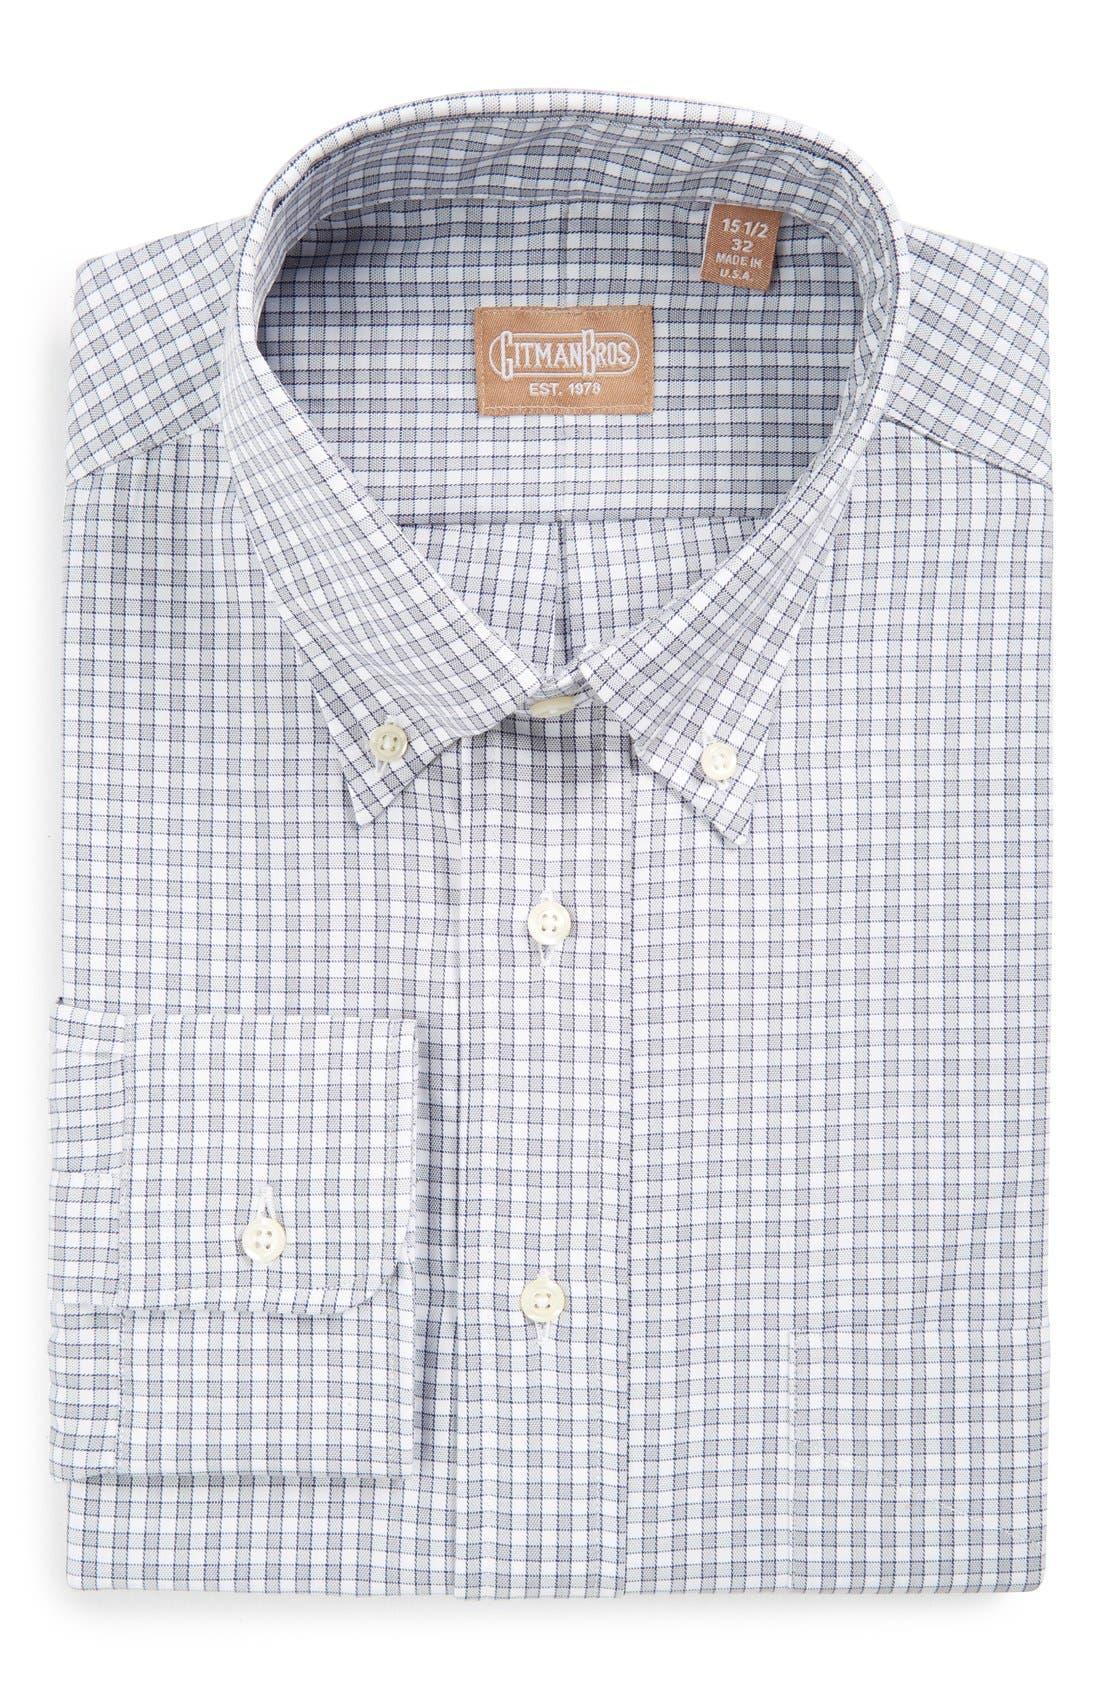 Main Image - Gitman Regular Fit Gingham Check Dress Shirt